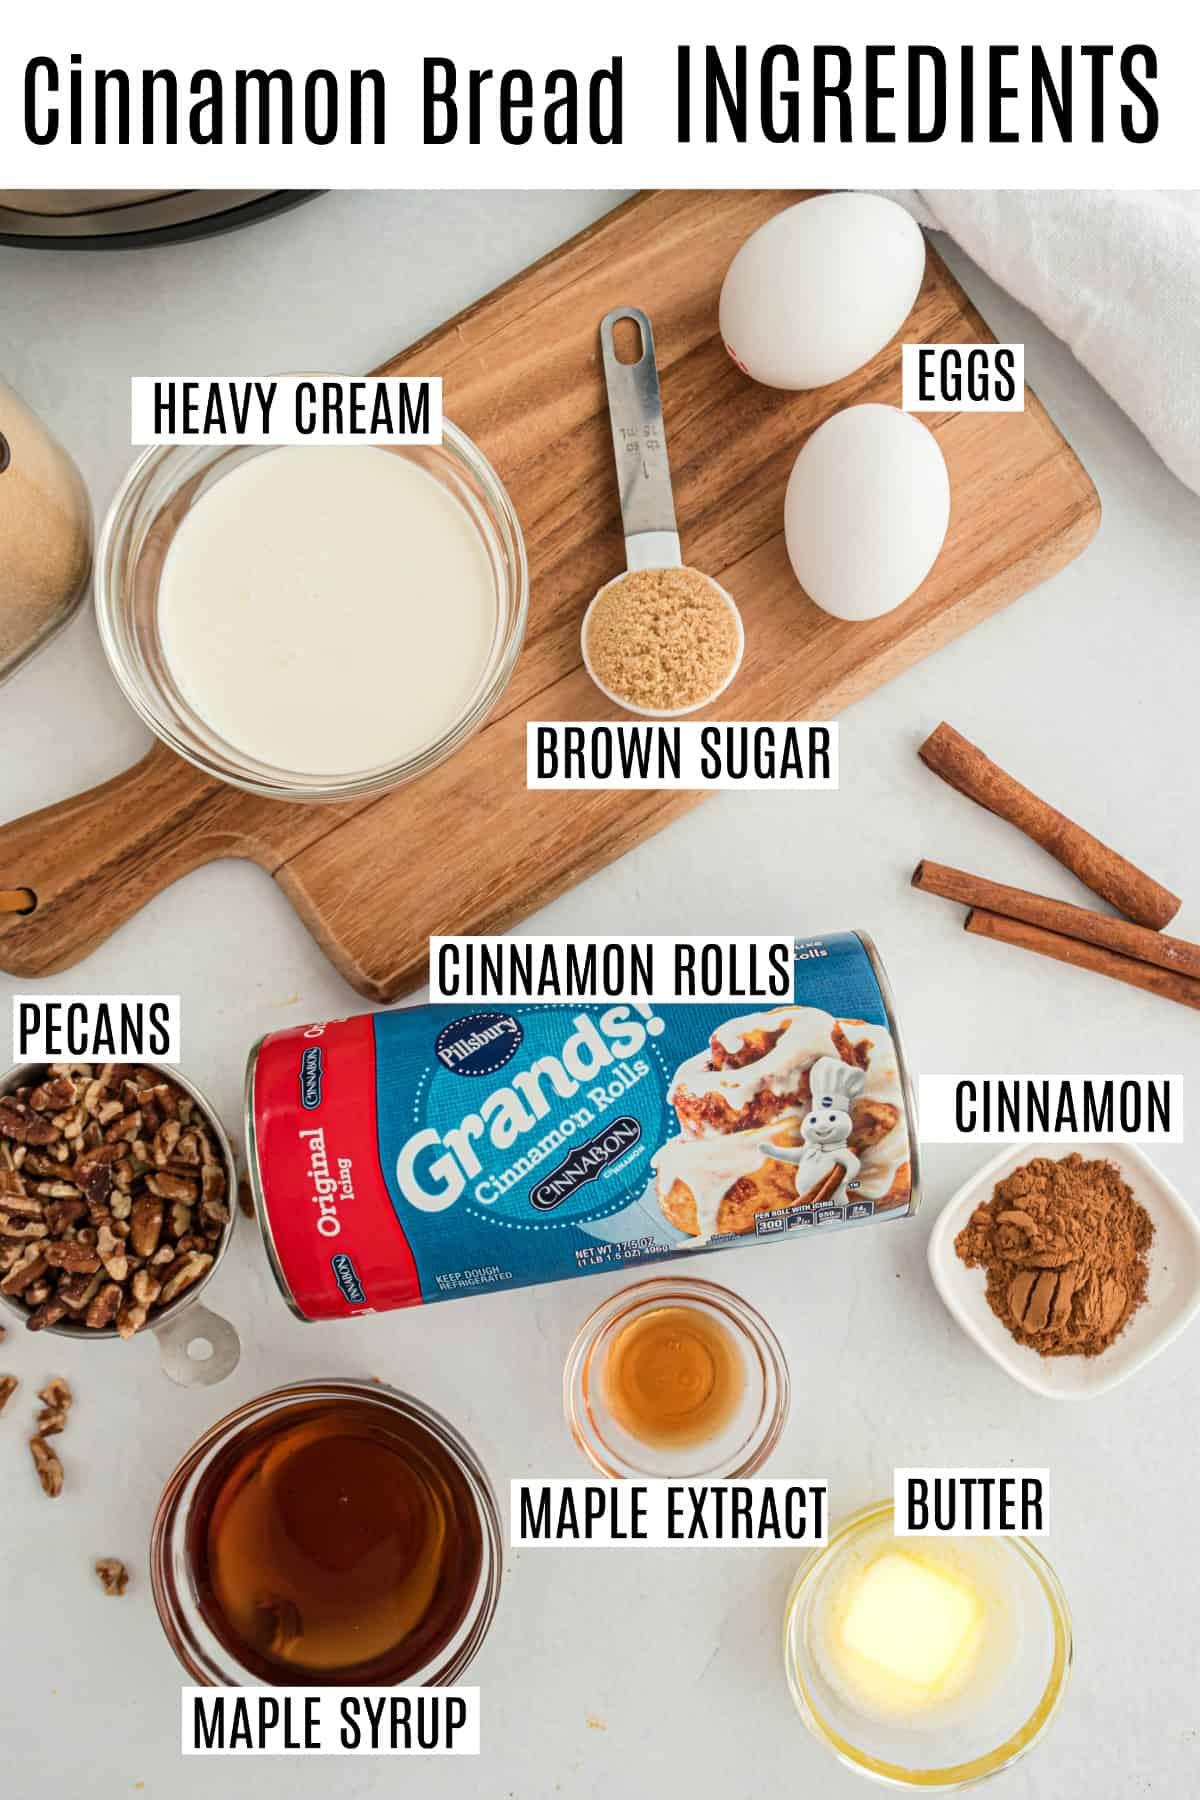 Ingredients needed to make cinnamon roll bread including pillsbury cinnamon rolls.